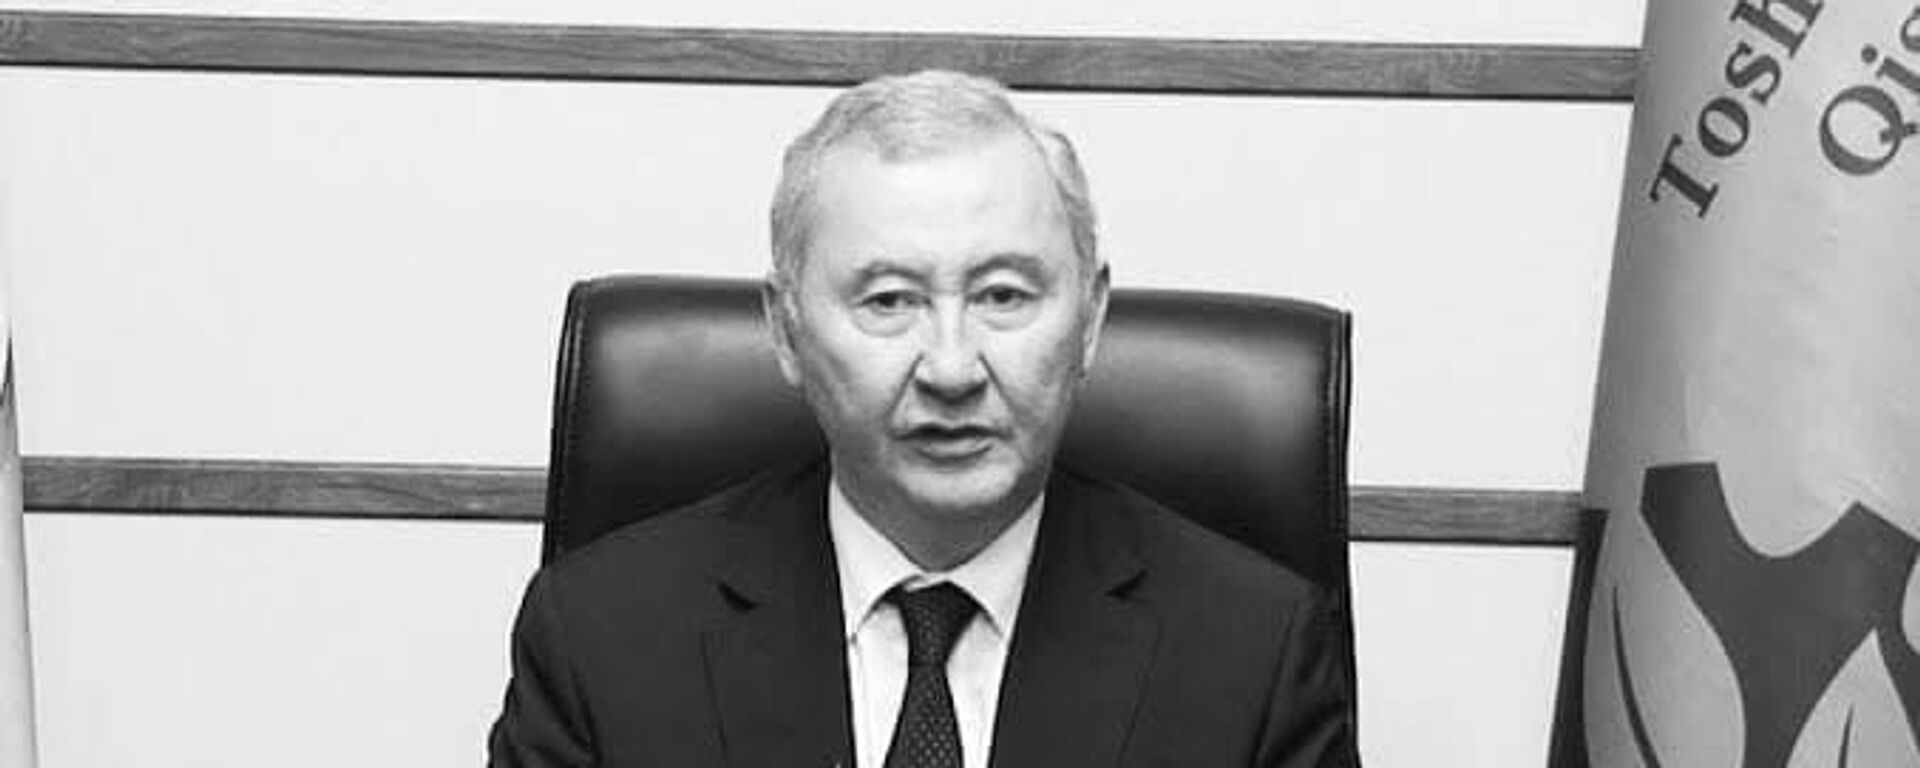 Умер ректор ирригационного института Уктам Умурзаков - Sputnik Узбекистан, 1920, 26.07.2021